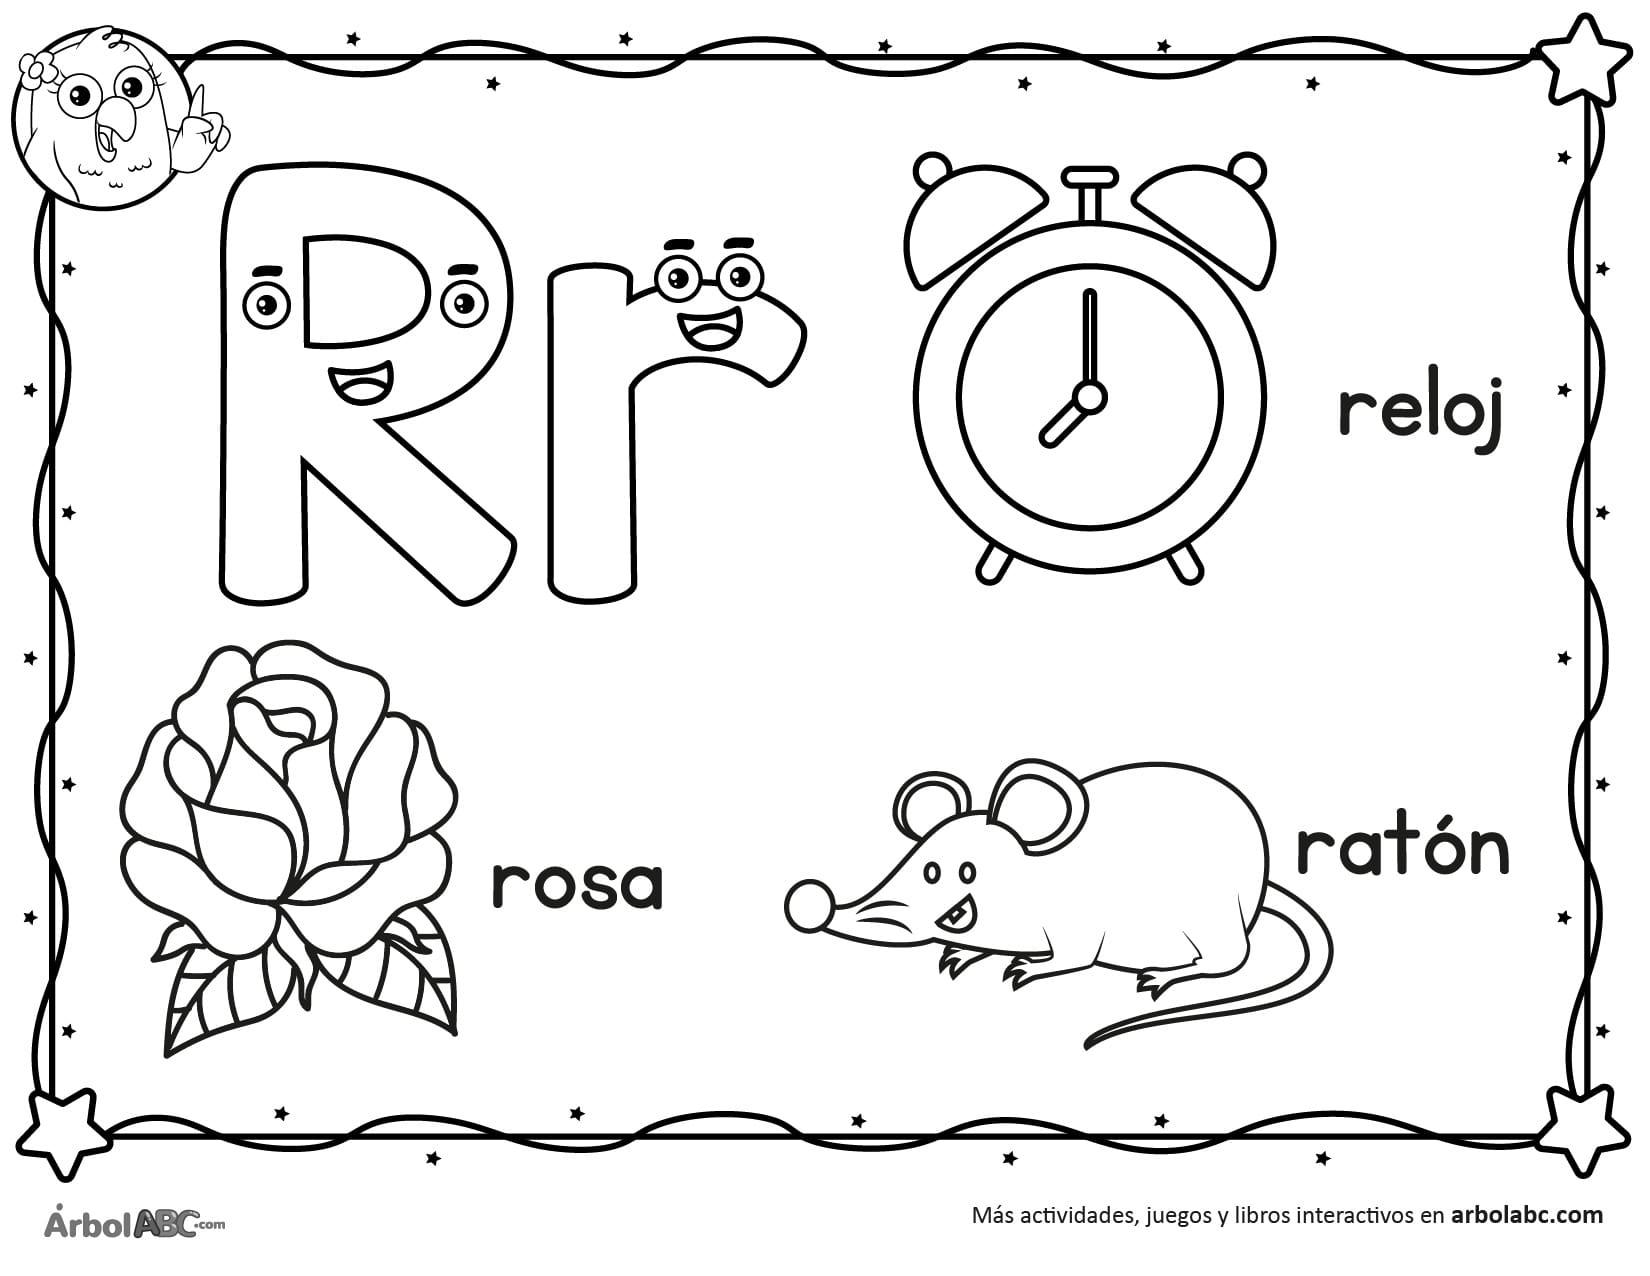 Letra R para colorear | Árbol ABC